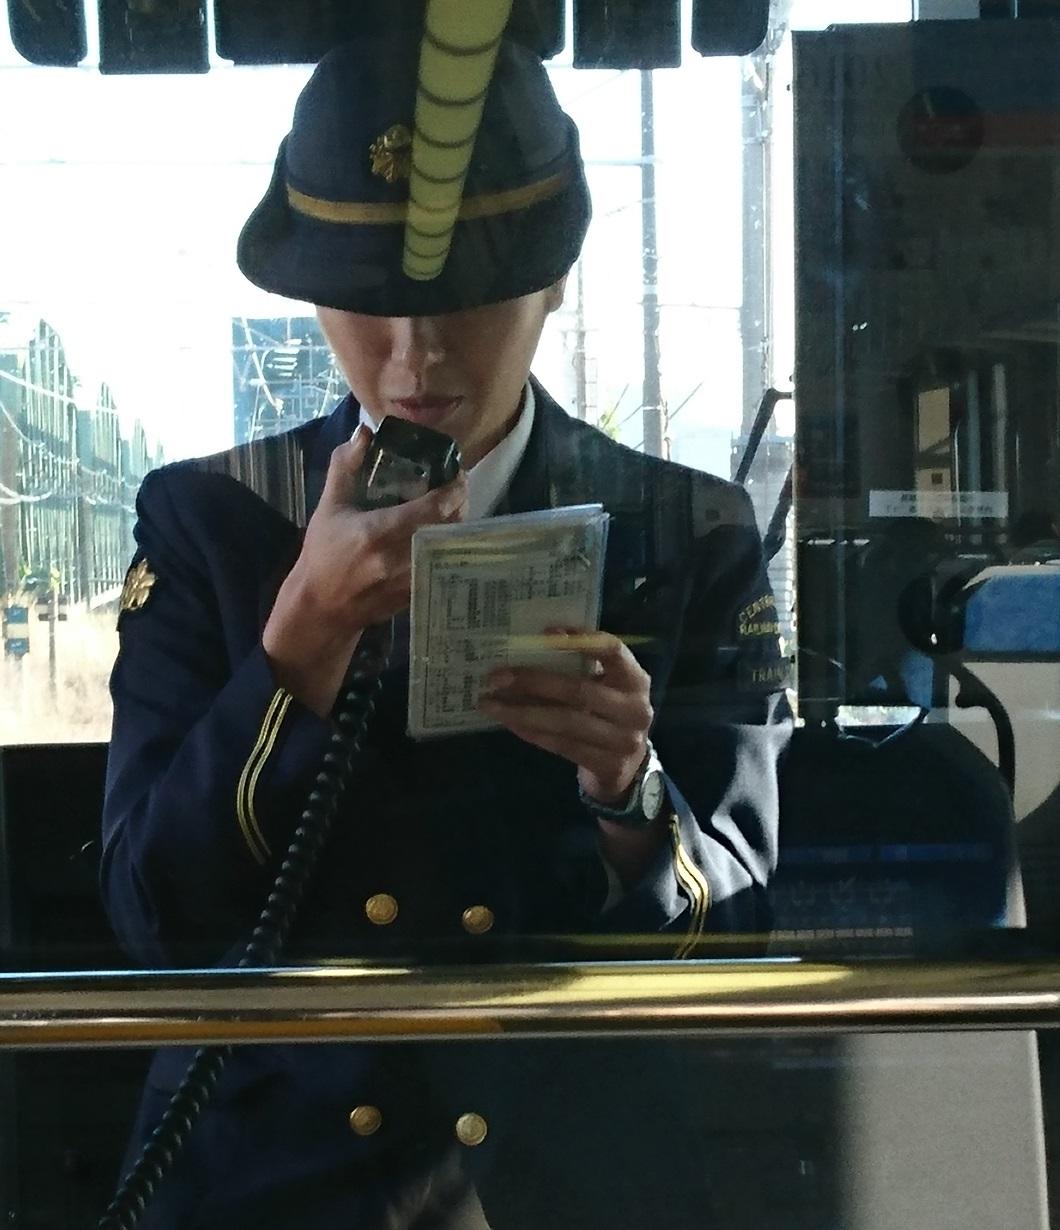 2016.11.16 東海道線 (11) 大垣いき特別快速 - 車内 1060-1230